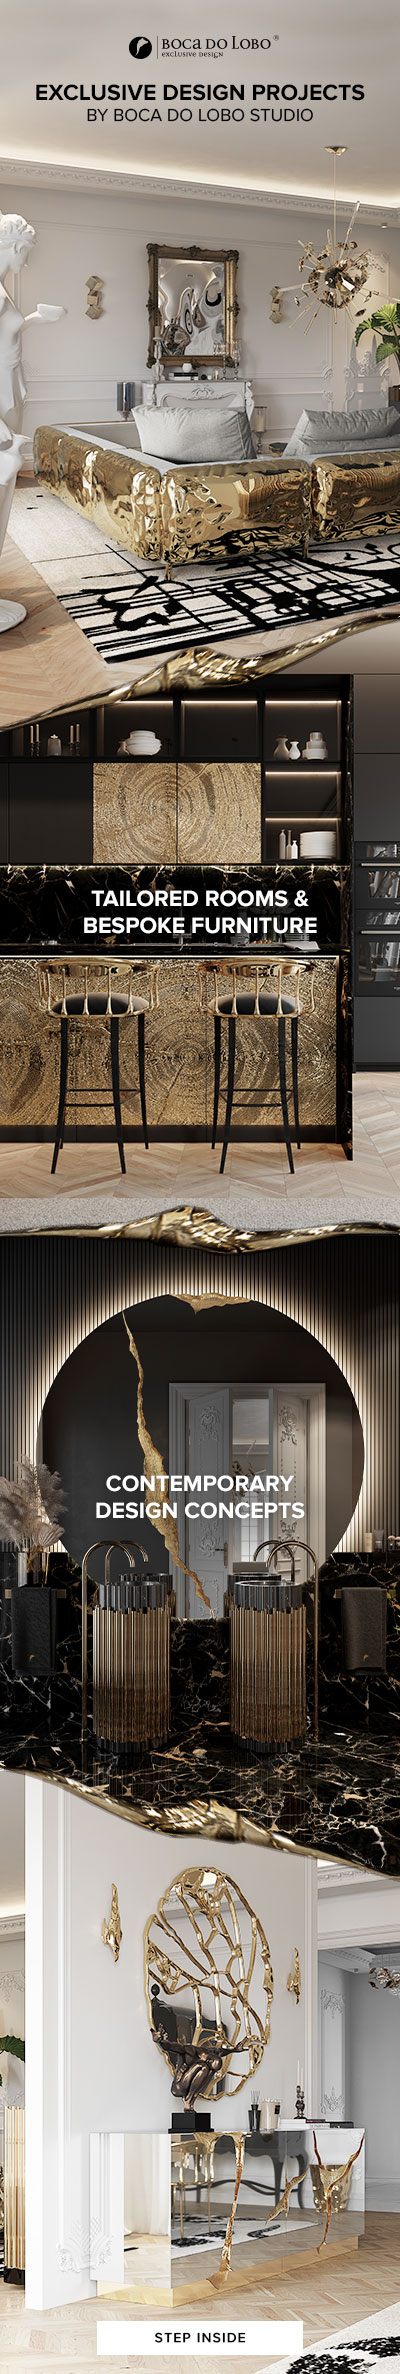 master bedroom ideas Master Bedroom Ideas sidebannermoodboardBL